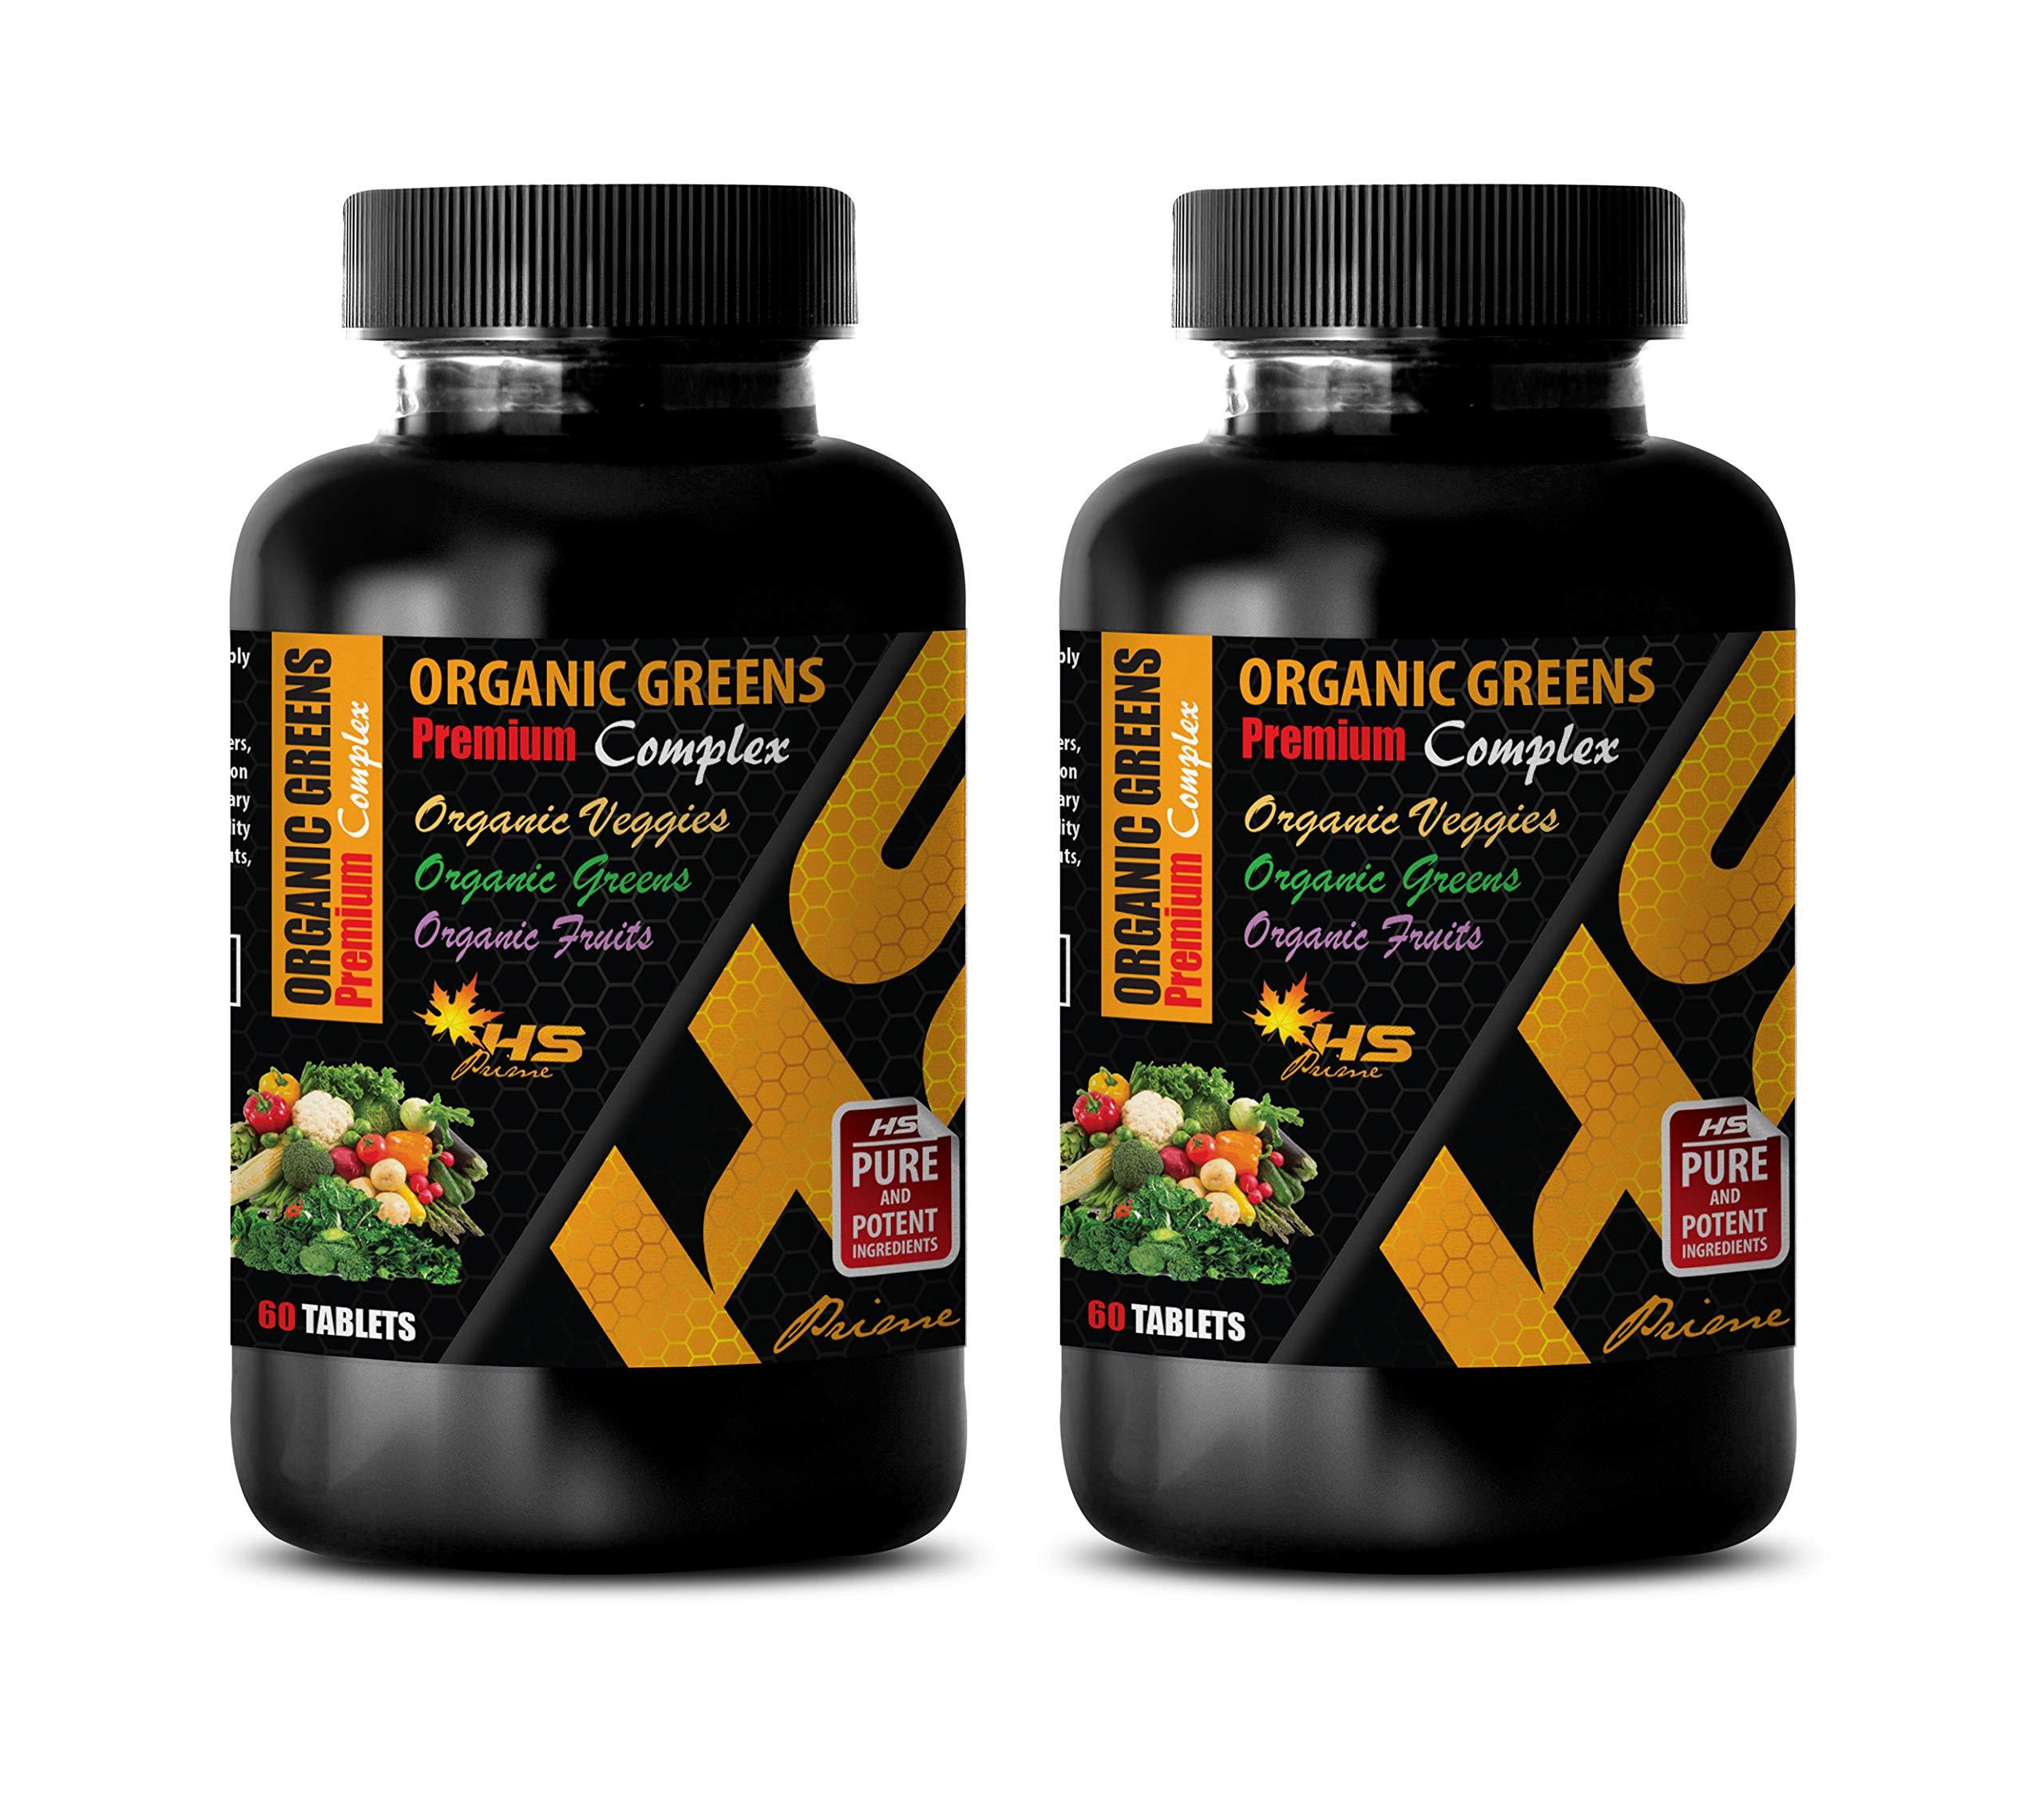 Immune System Pills Organic - Organic Greens - Premium Complex - Ginger Extract Bulk Supplements - 2 Bottles 120 Tablets